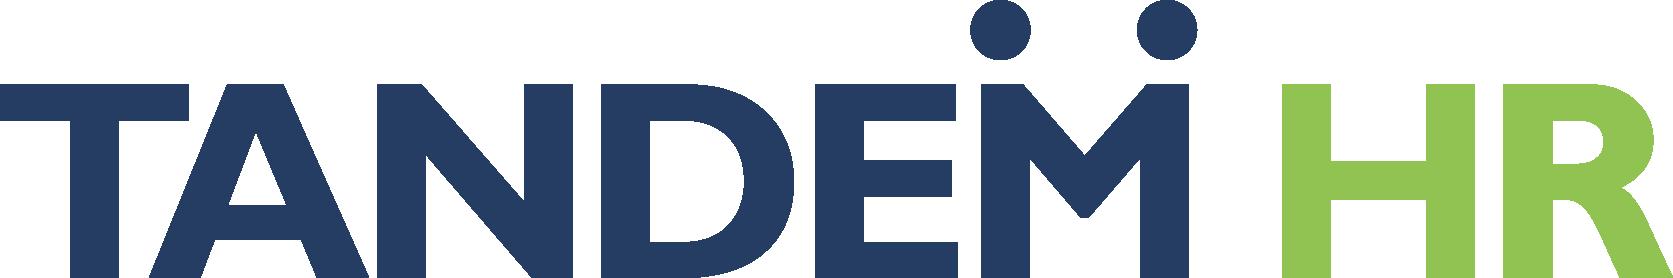 Tandem-HR-Logo-Transparent